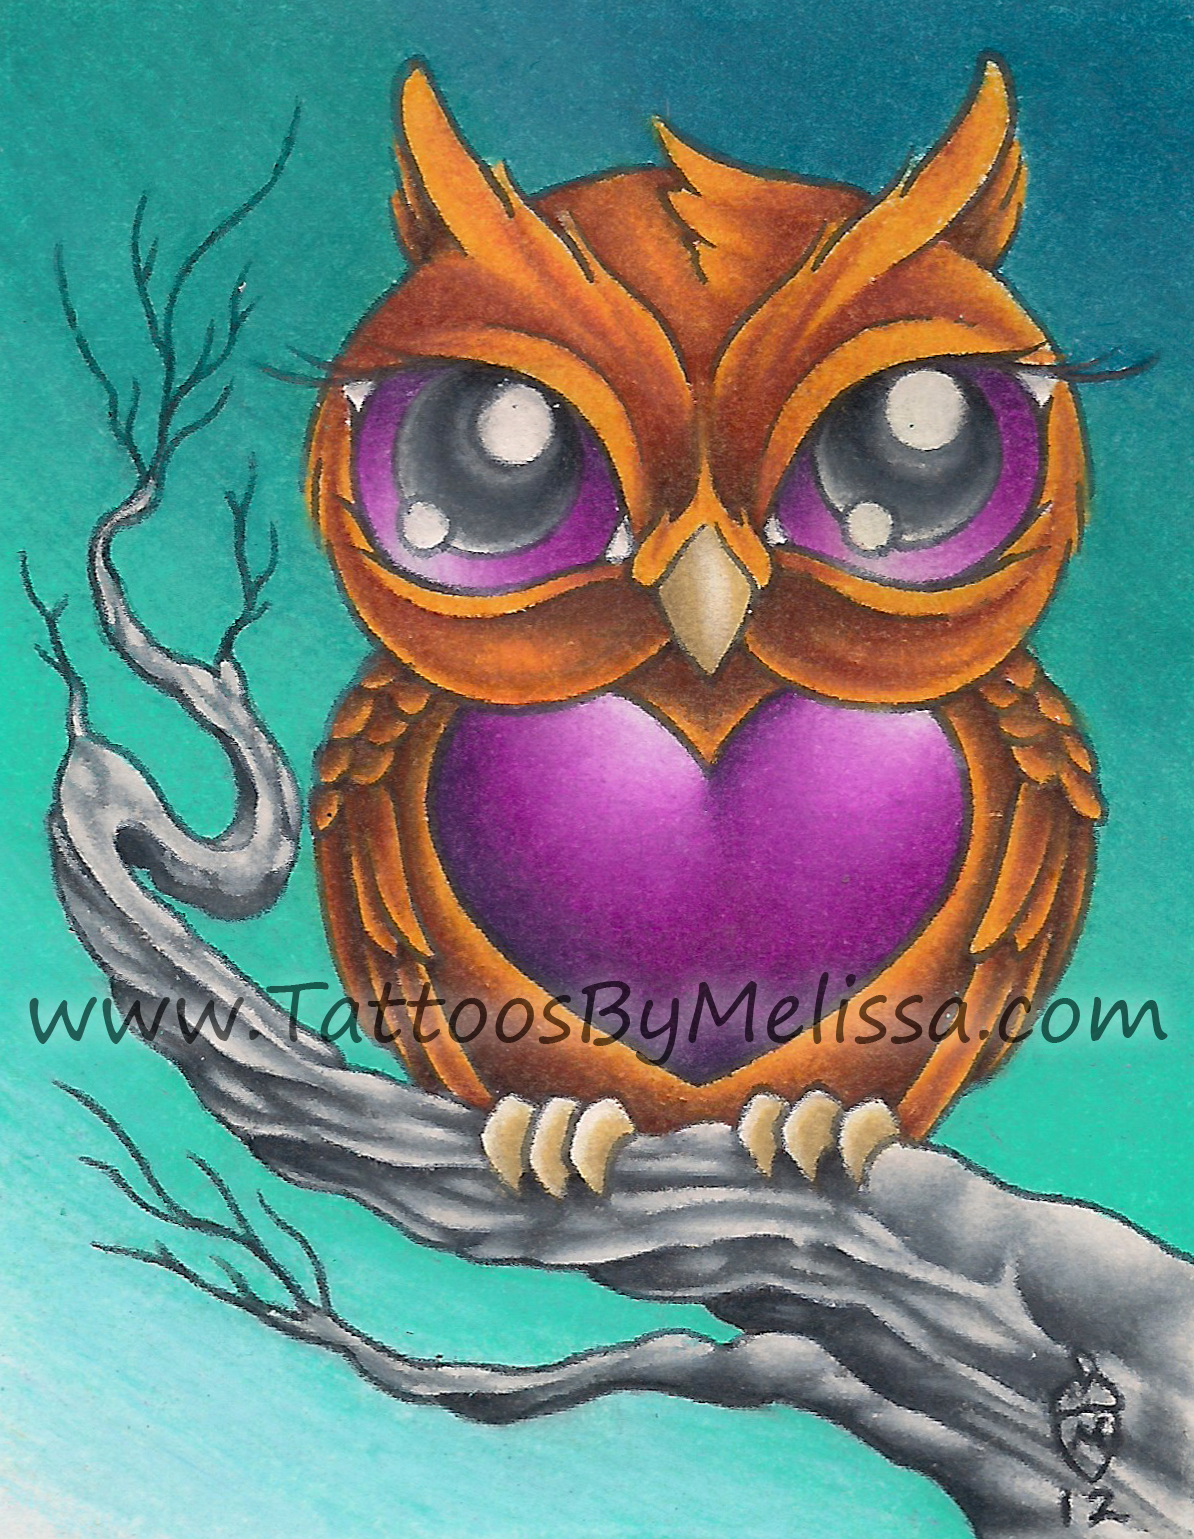 1194x1539 Cute Owl 2.5x3 Colored Pencils On Bristol Paper Artistmelissa